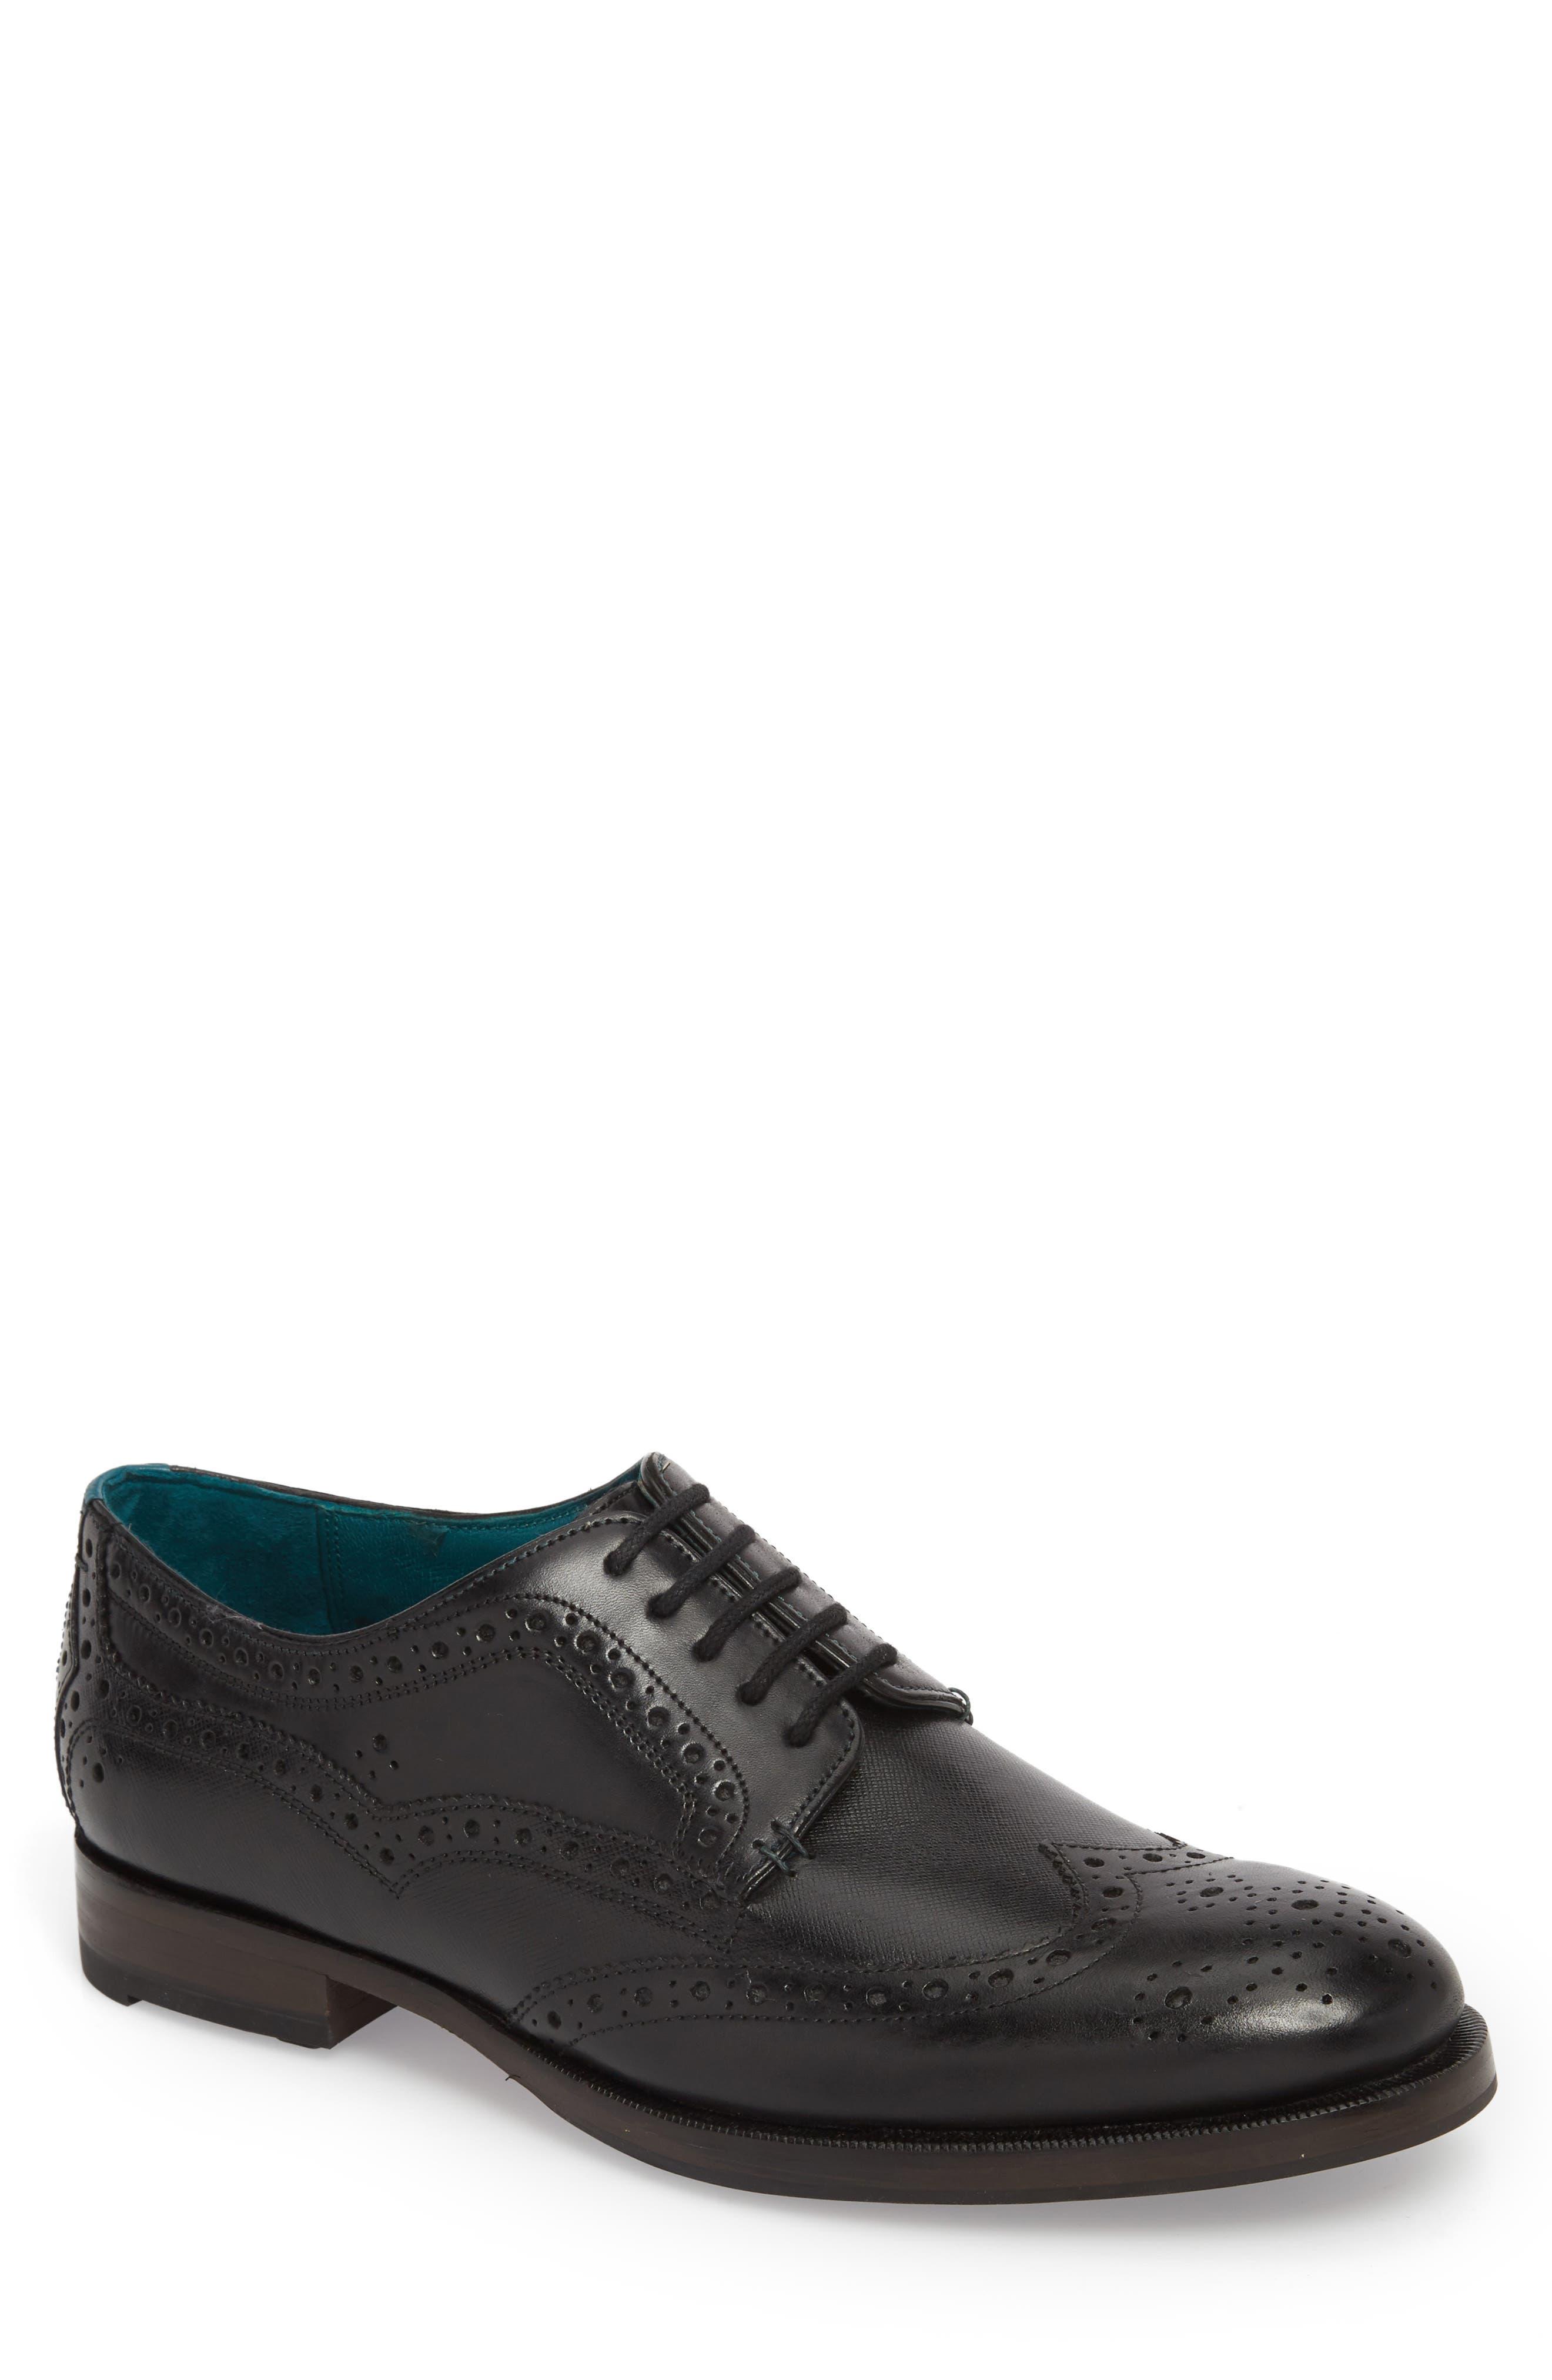 Senape Wingtip,                         Main,                         color, Black Leather